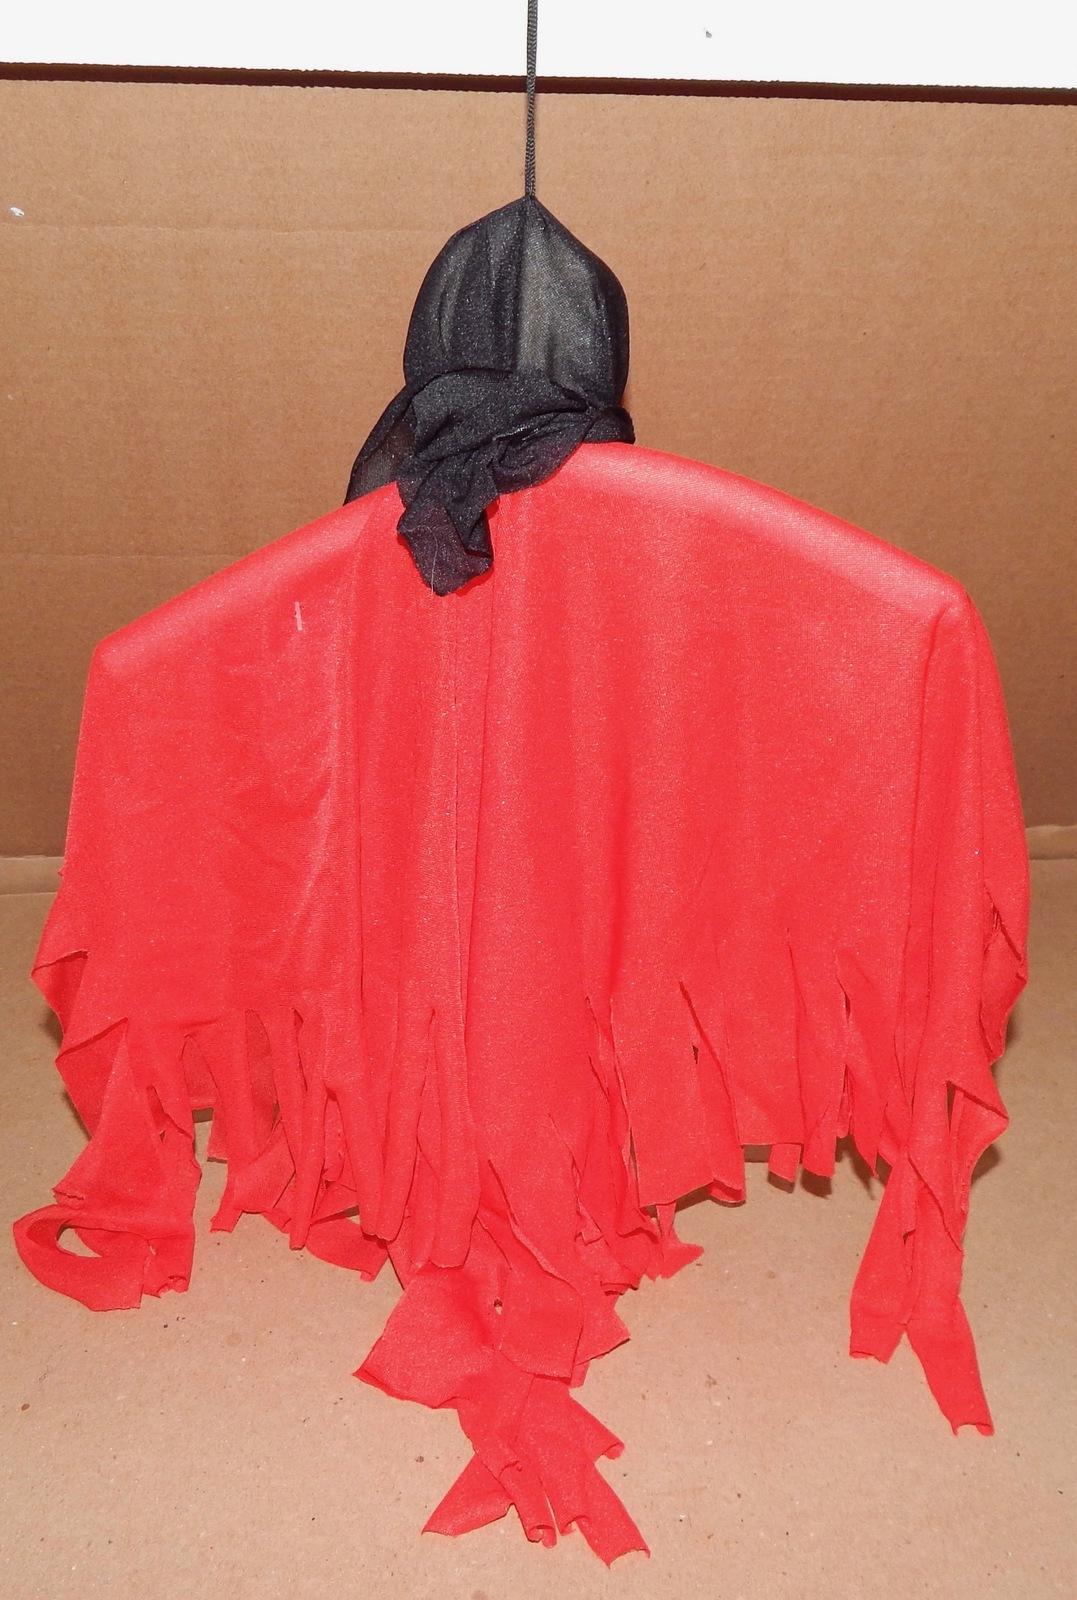 "Halloween Decorative Hanging Decoration Ghost Skulls 3ea 15"" x 10"" Bendable 129E"